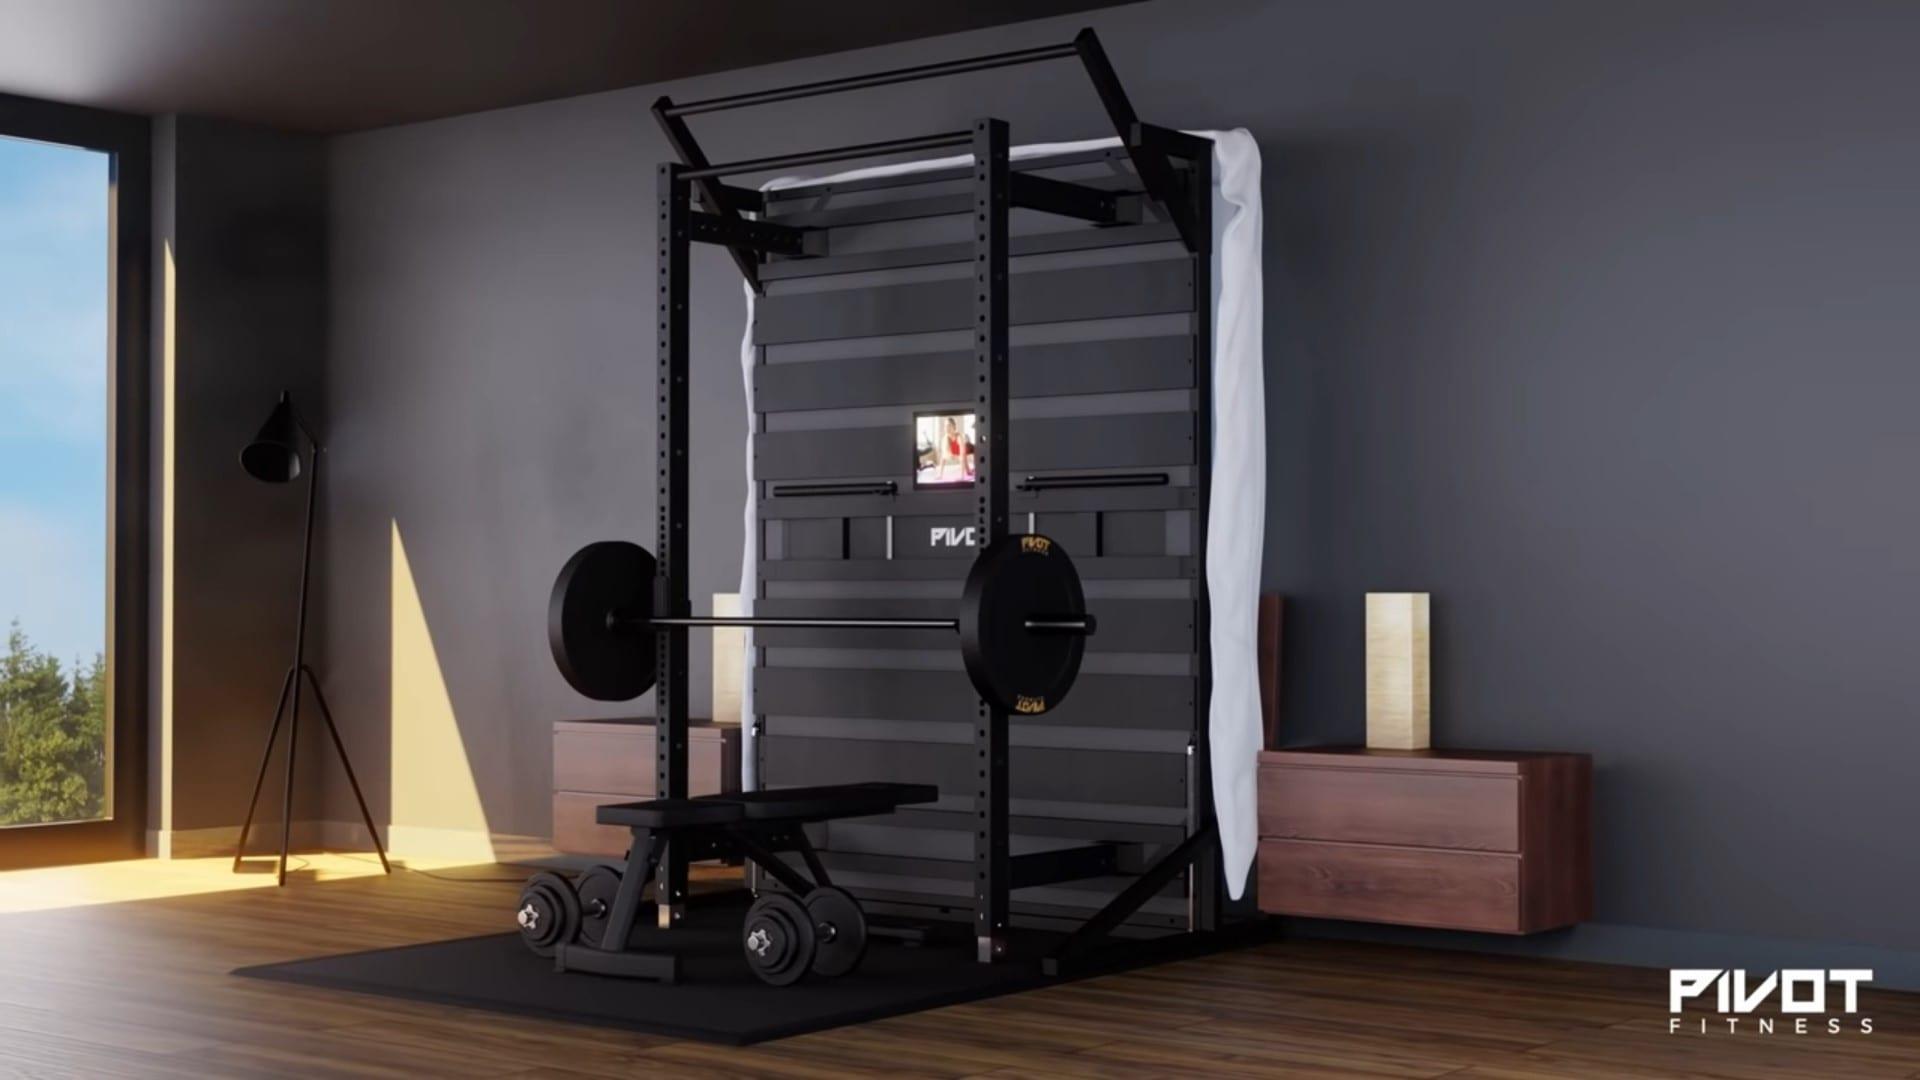 Pivot Home Gym & Bed